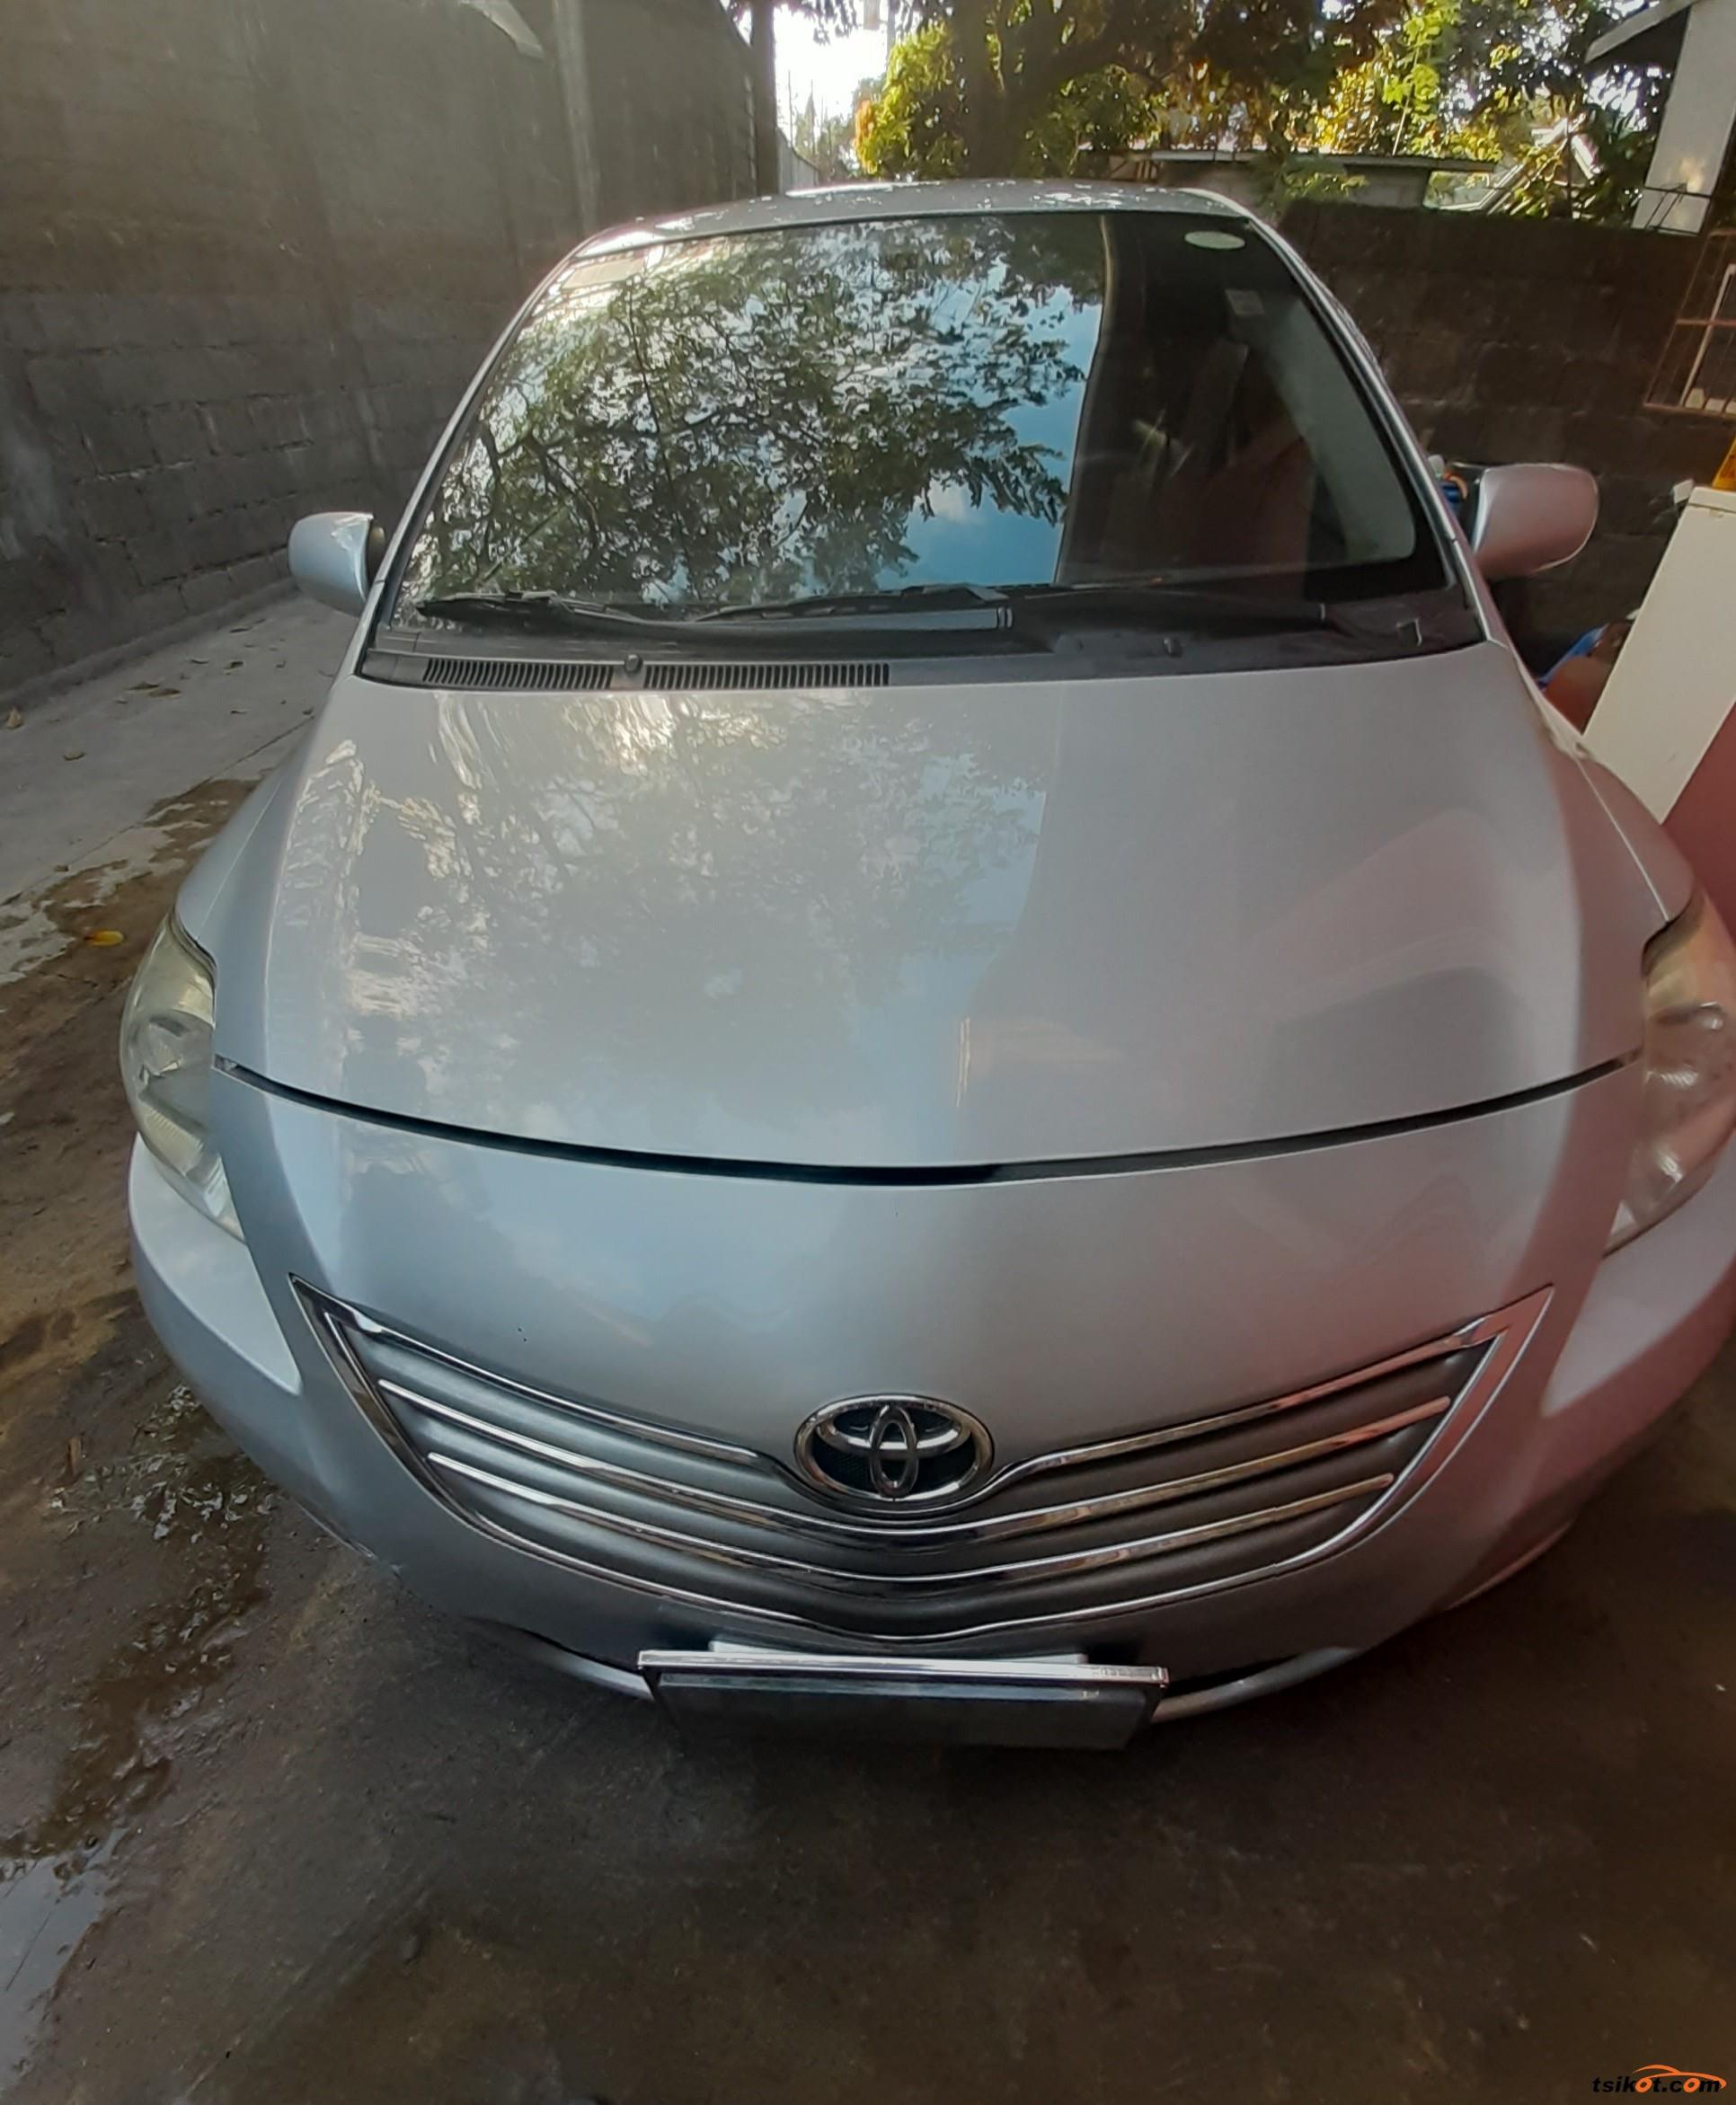 Toyota Vios 2012 - 1